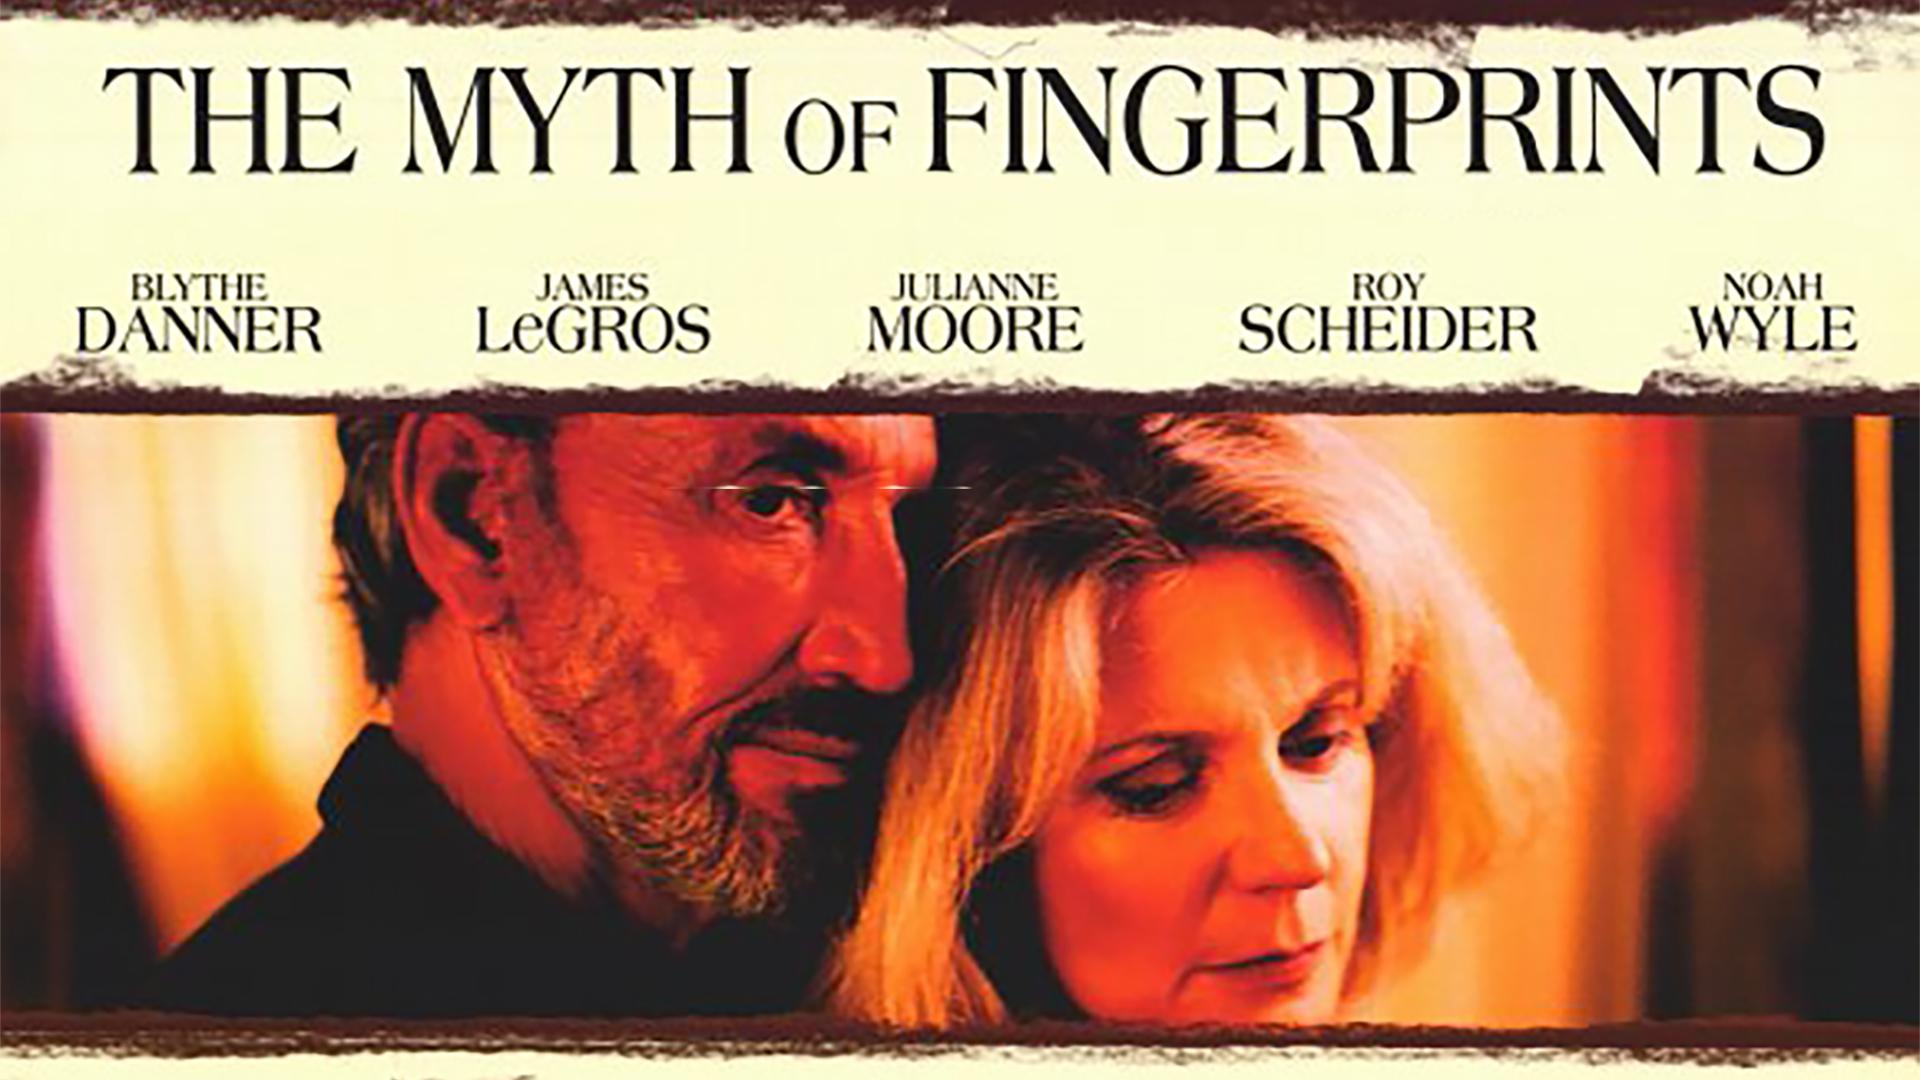 The Myth of Fingerprints